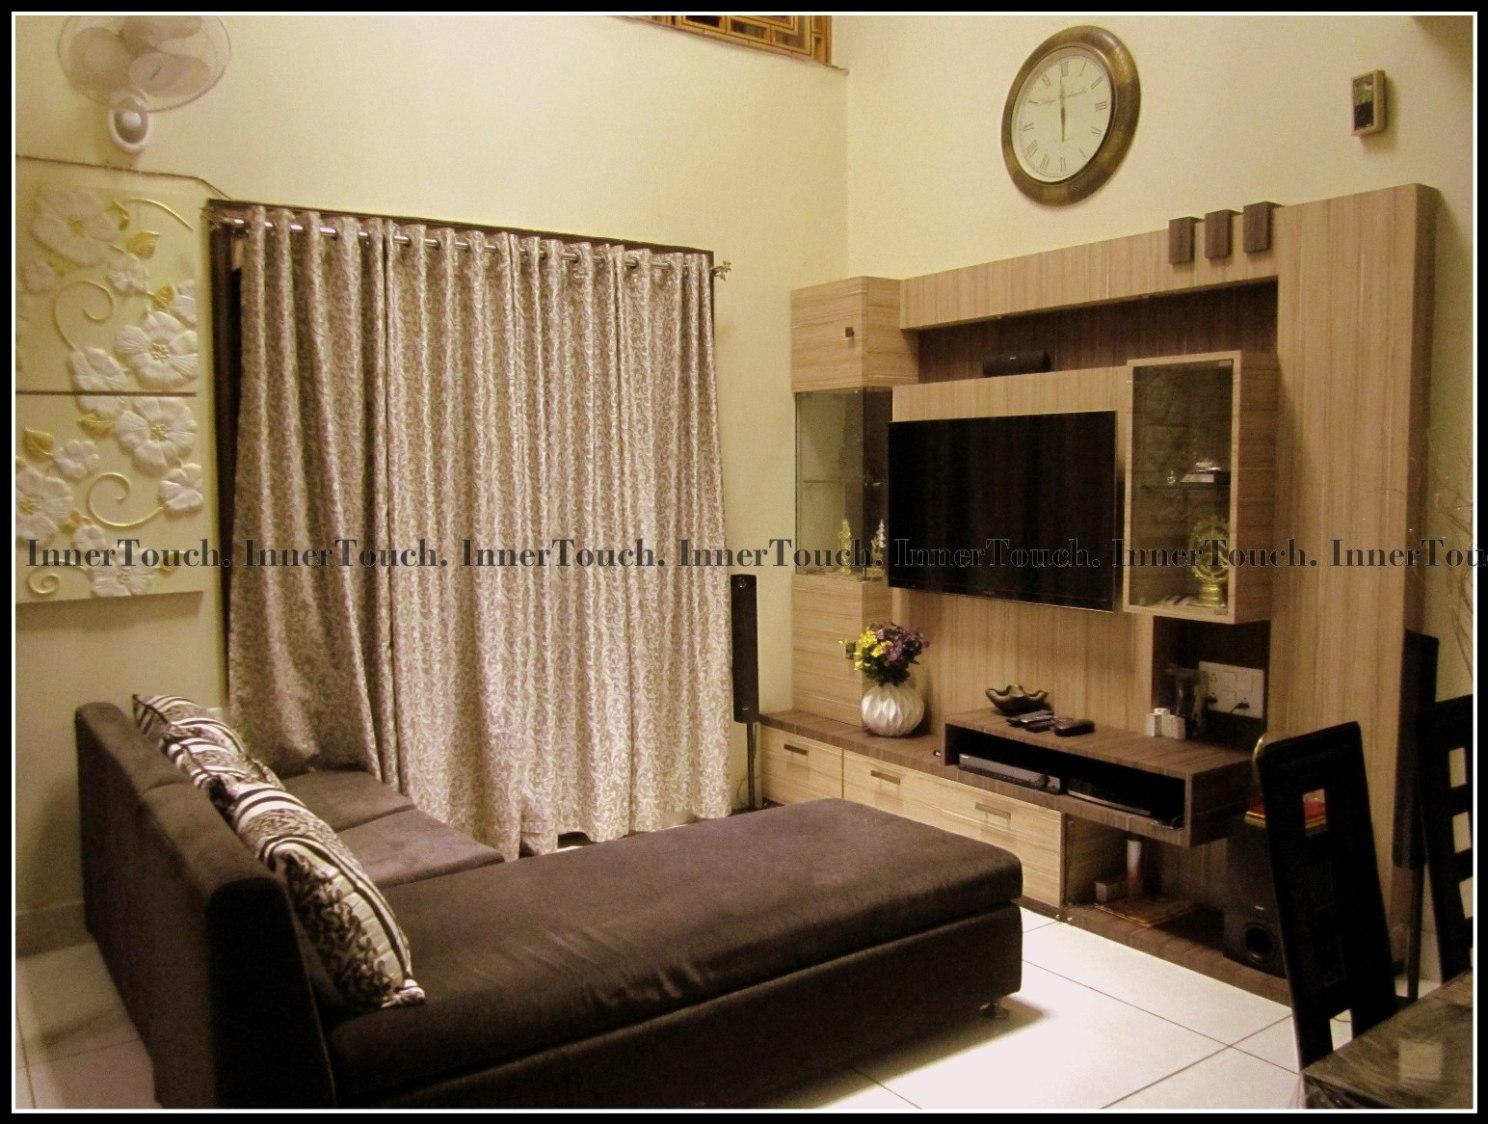 The Compact Show by Jhumur Ghosh Chaki Modern | Interior Design Photos & Ideas